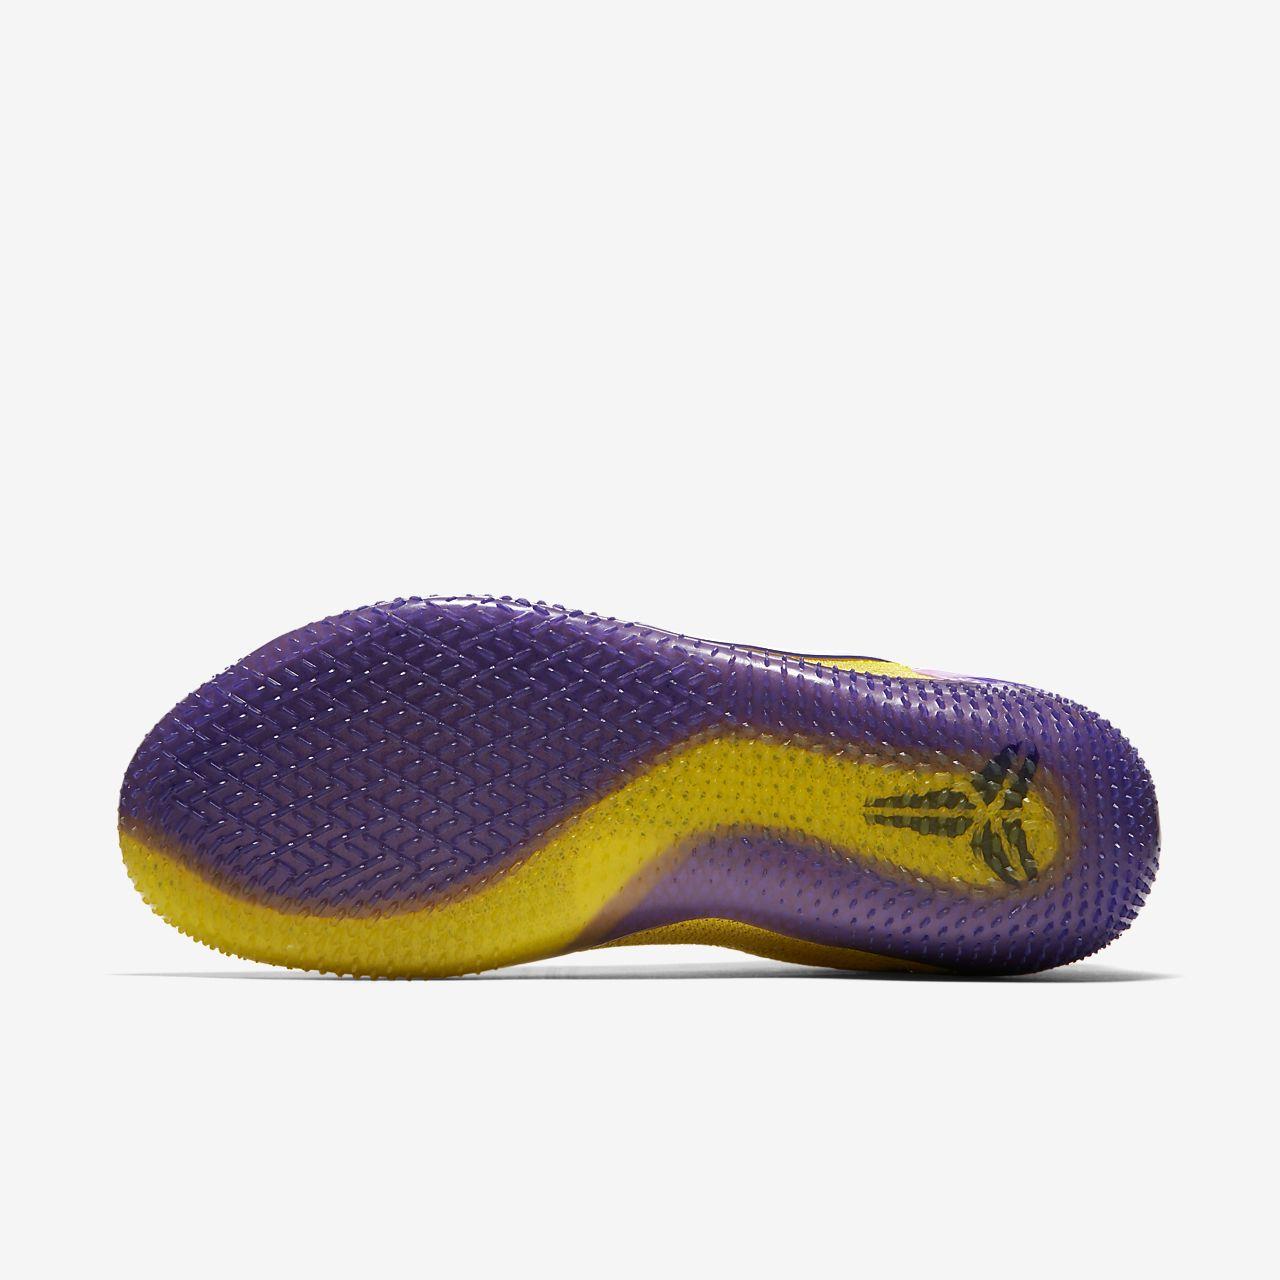 100% authentic 5f281 516d9 ... Calzado de básquetbol Kobe A.D. NXT 360